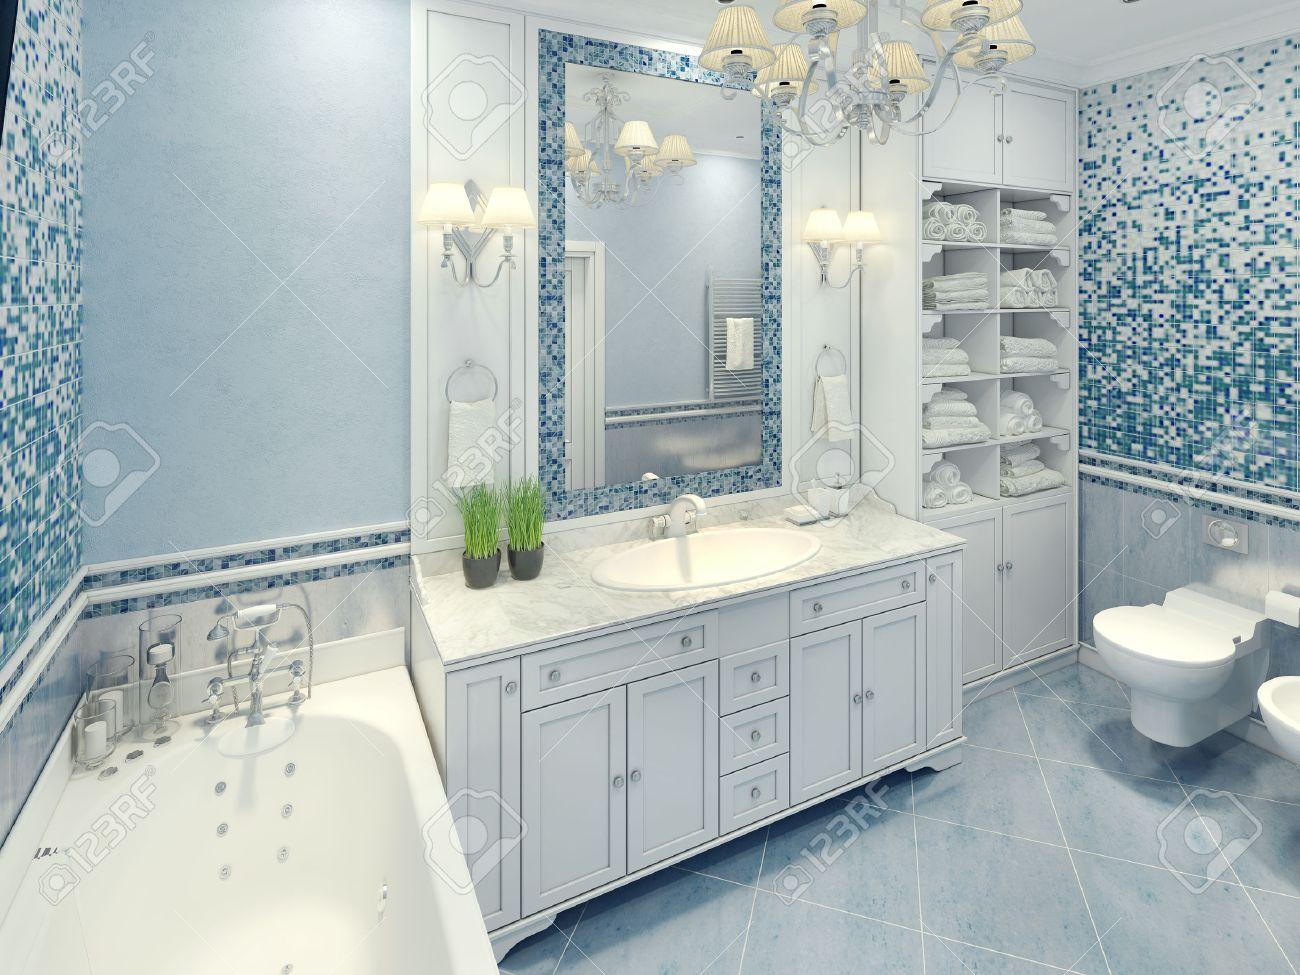 Period Bathroom Accessories Art Deco Bathroom Accessories Deco Bathroom Accessories